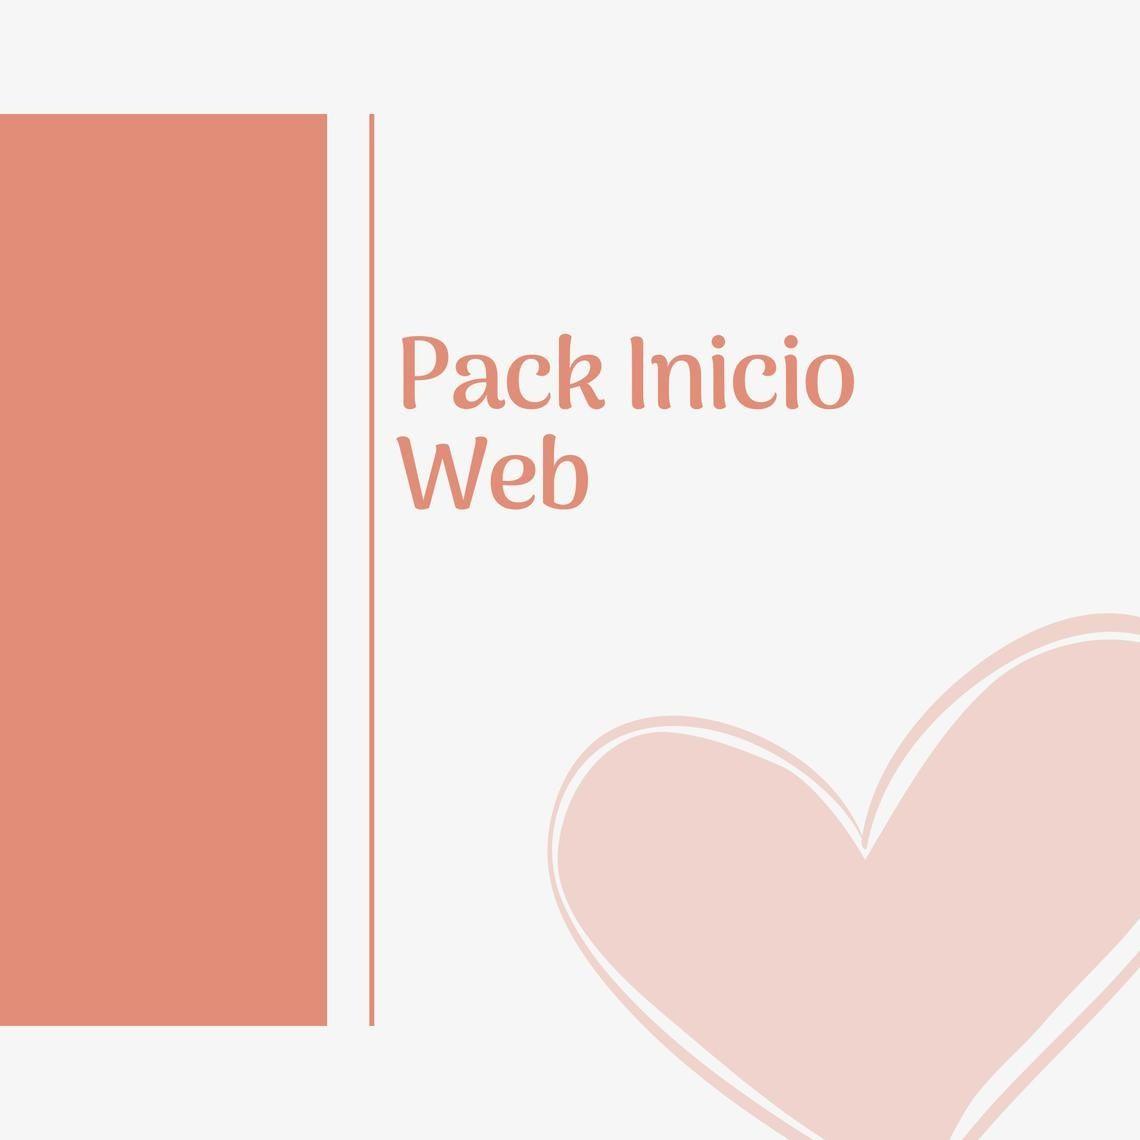 pack inicio web wordpress